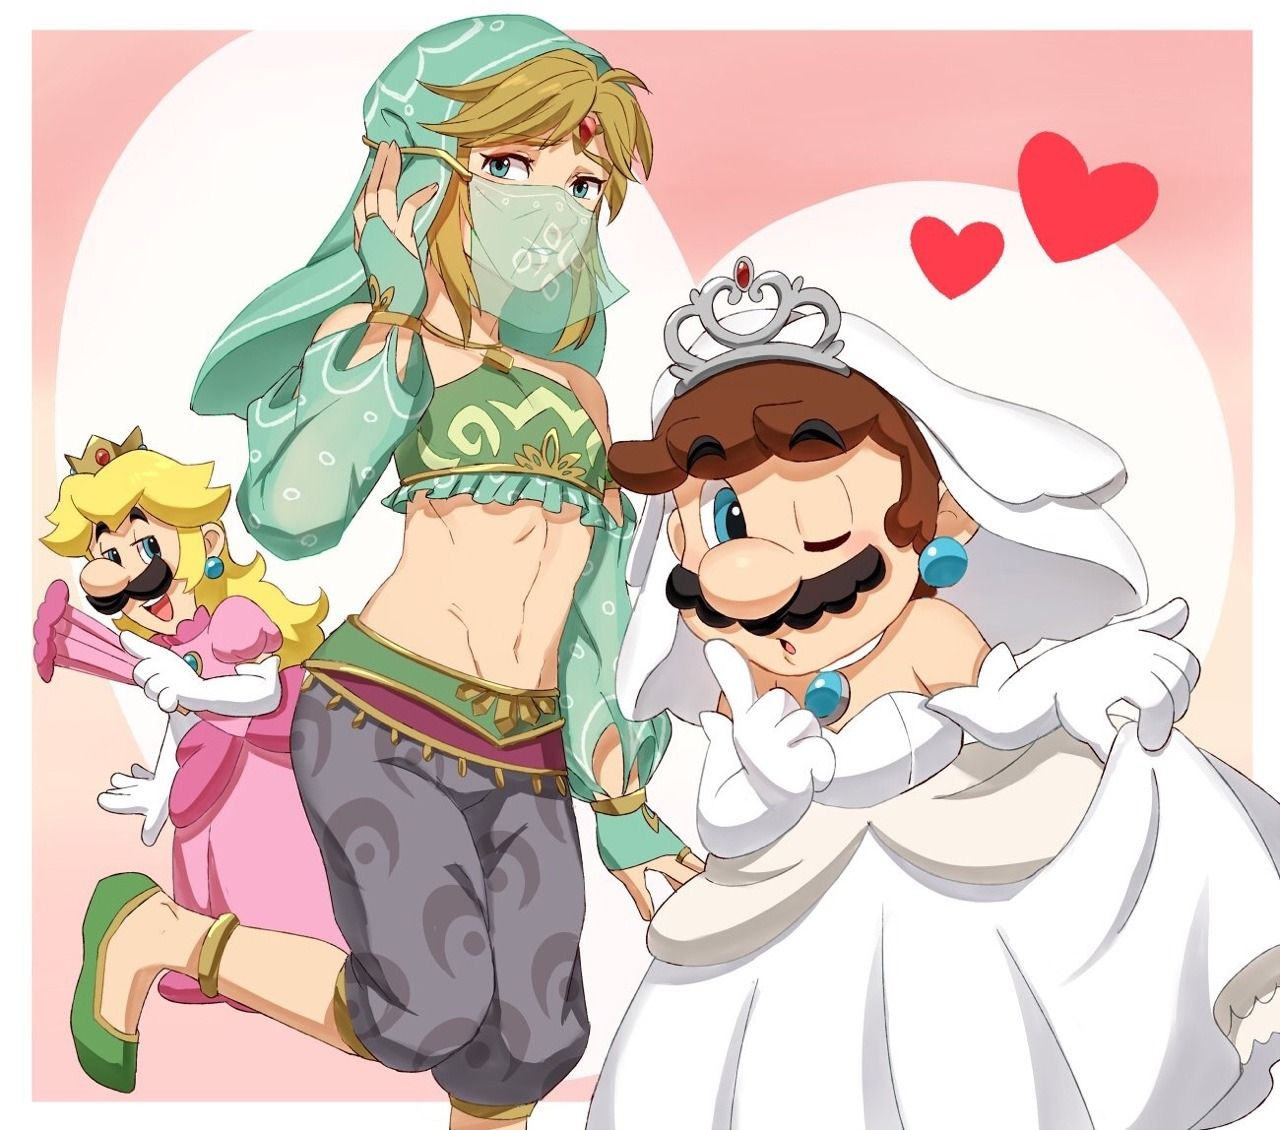 Mario, Luigi and Link Rocking it, guys! Mario and luigi